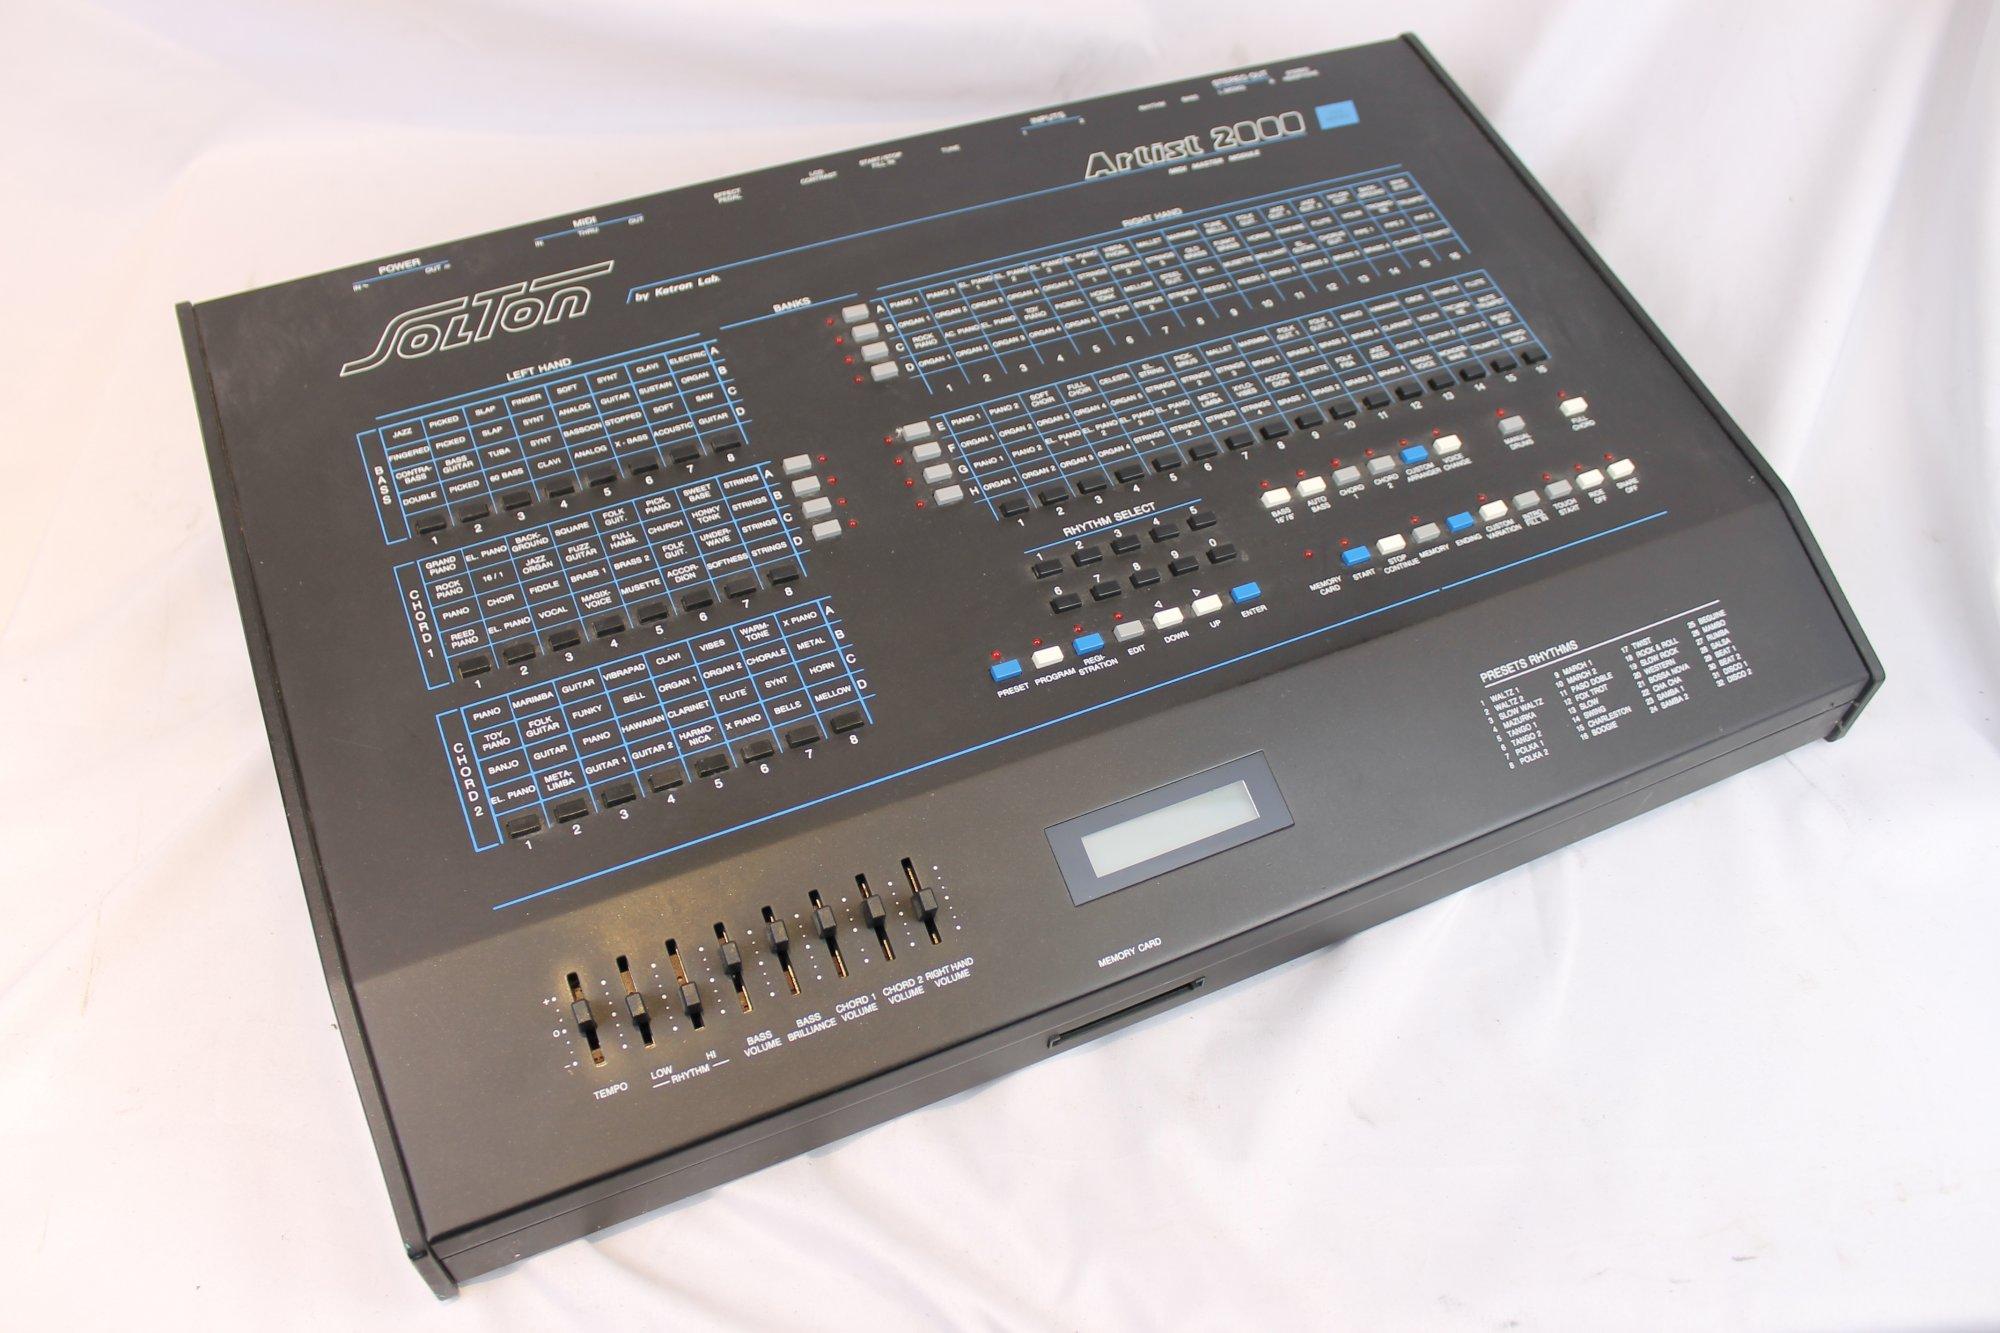 4304 - Ketron Solton Artist 2000 Midi Arranger and Sound Module